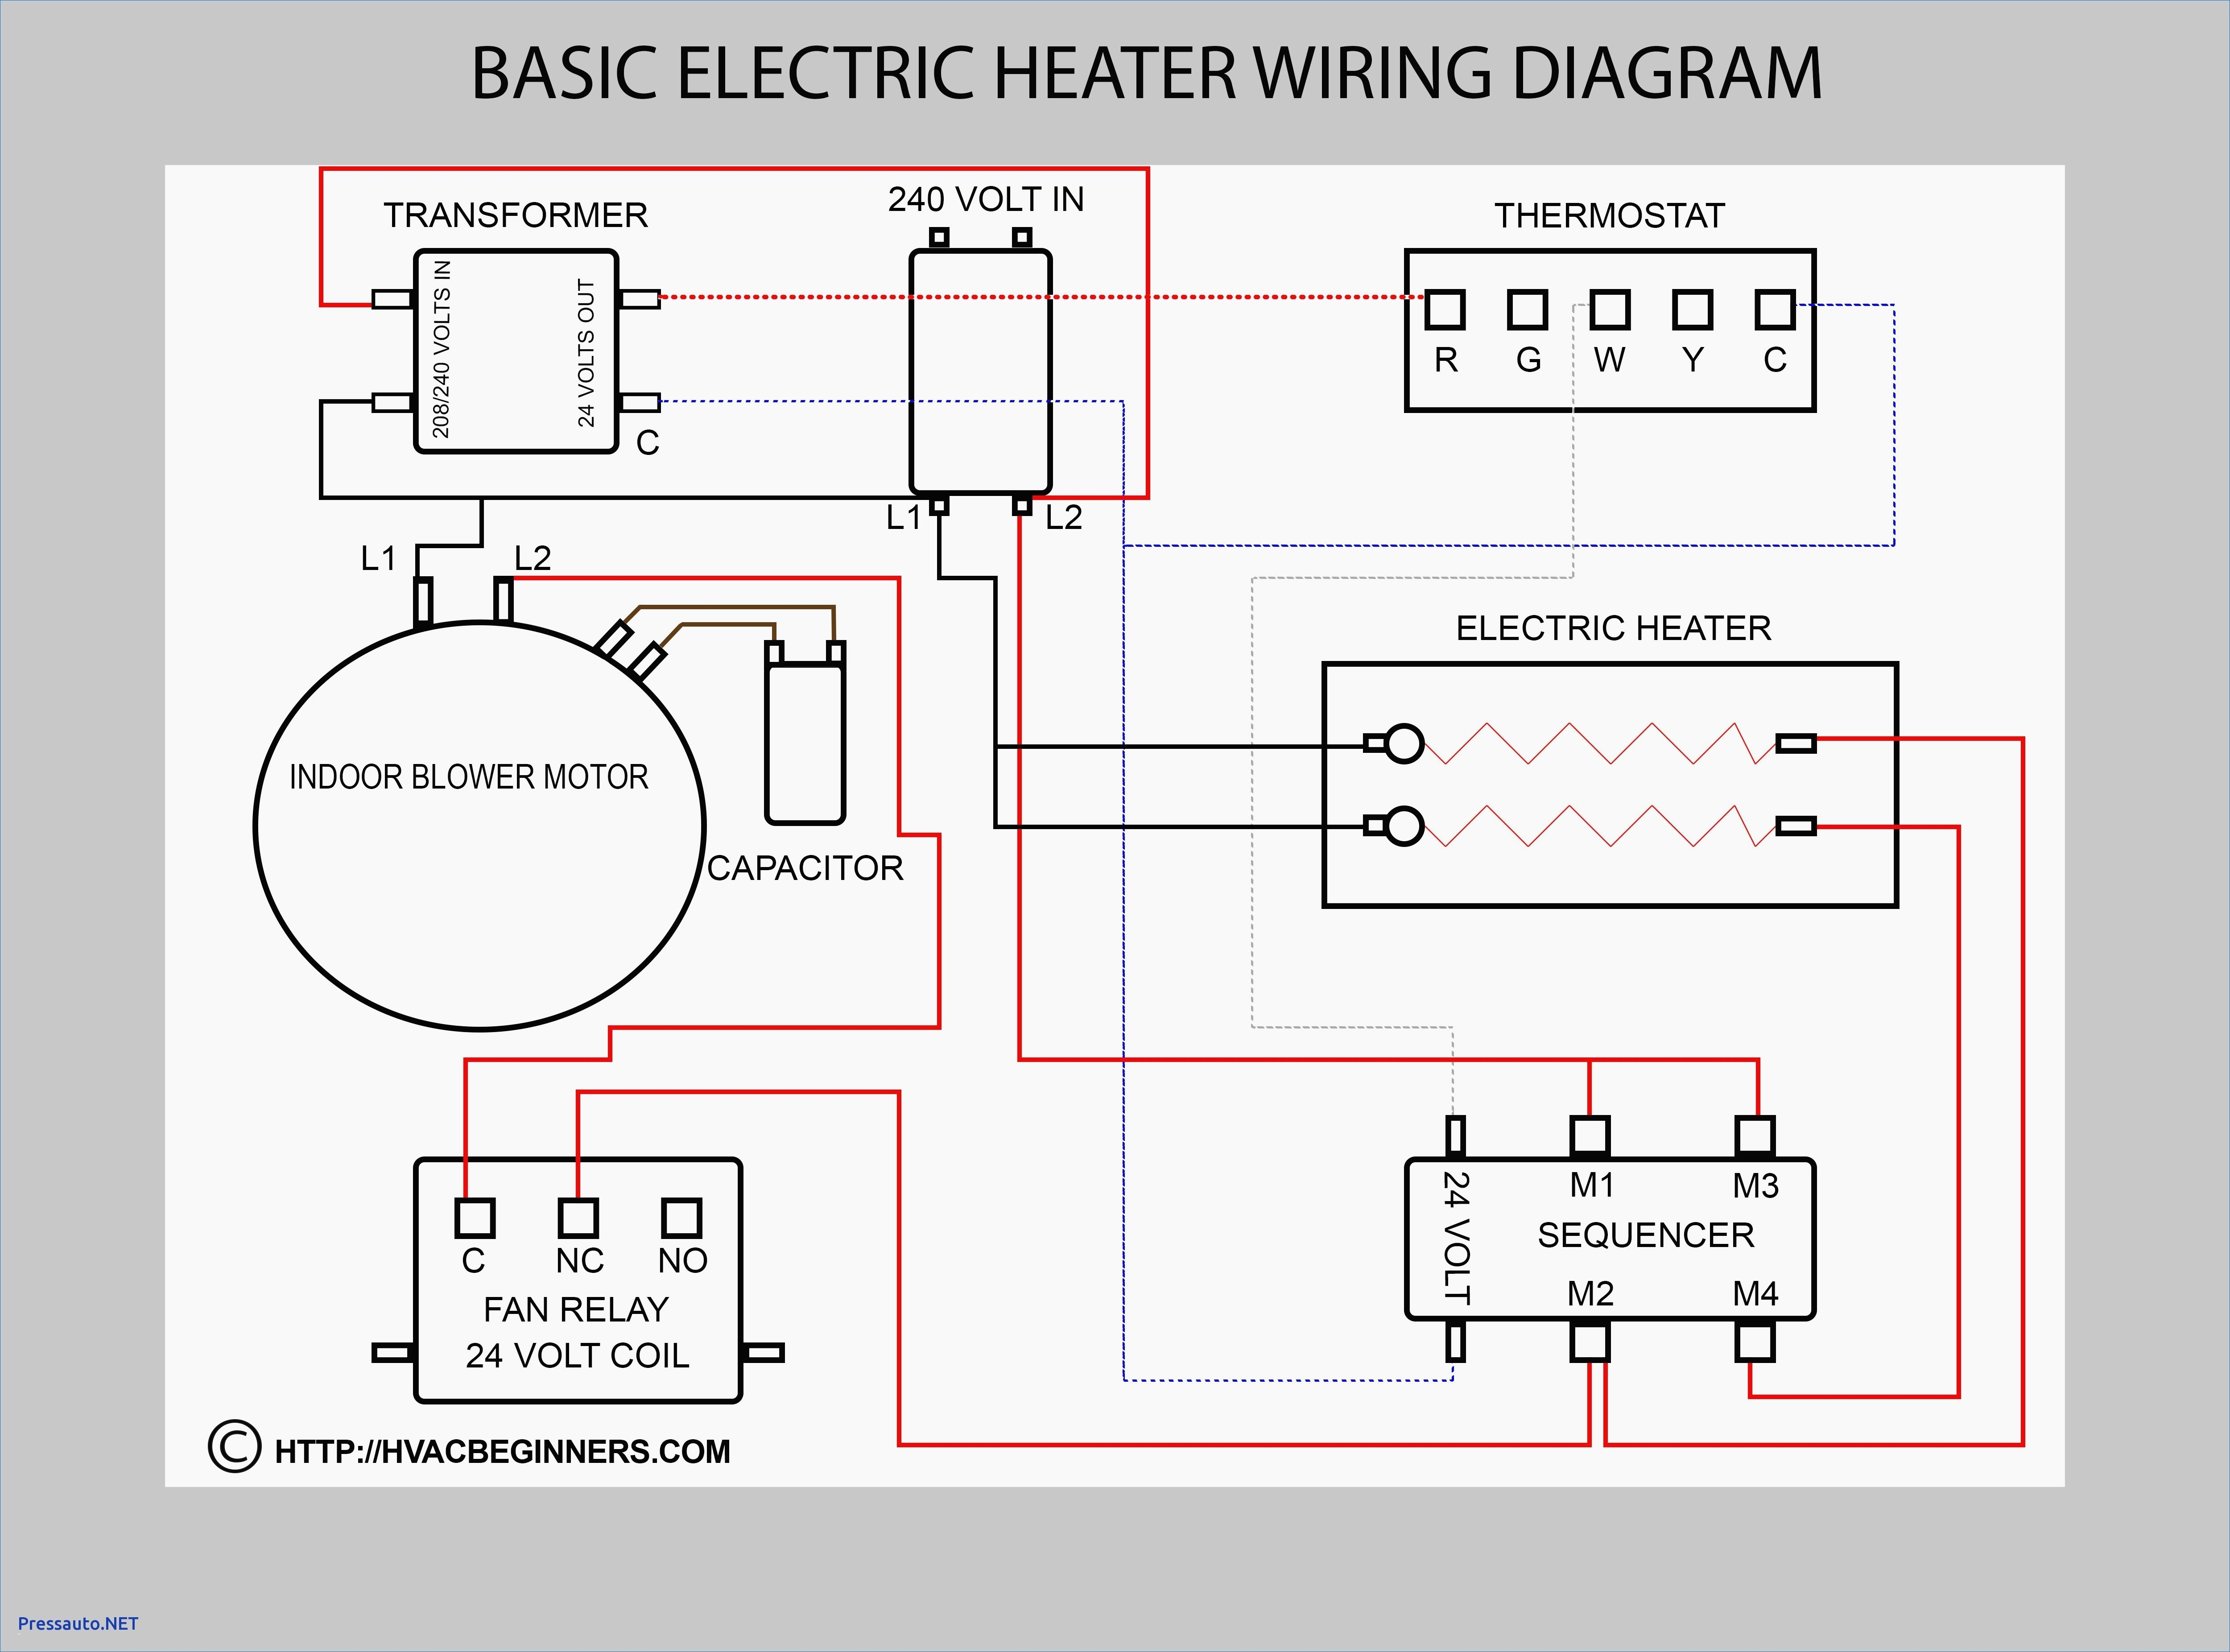 goodman heat pump wiring diagram thermostat Download-Goodman Heat Pump Wiring Diagram Inspirational Elegant Heat Pump thermostat Wiring Diagram Diagram 4-p